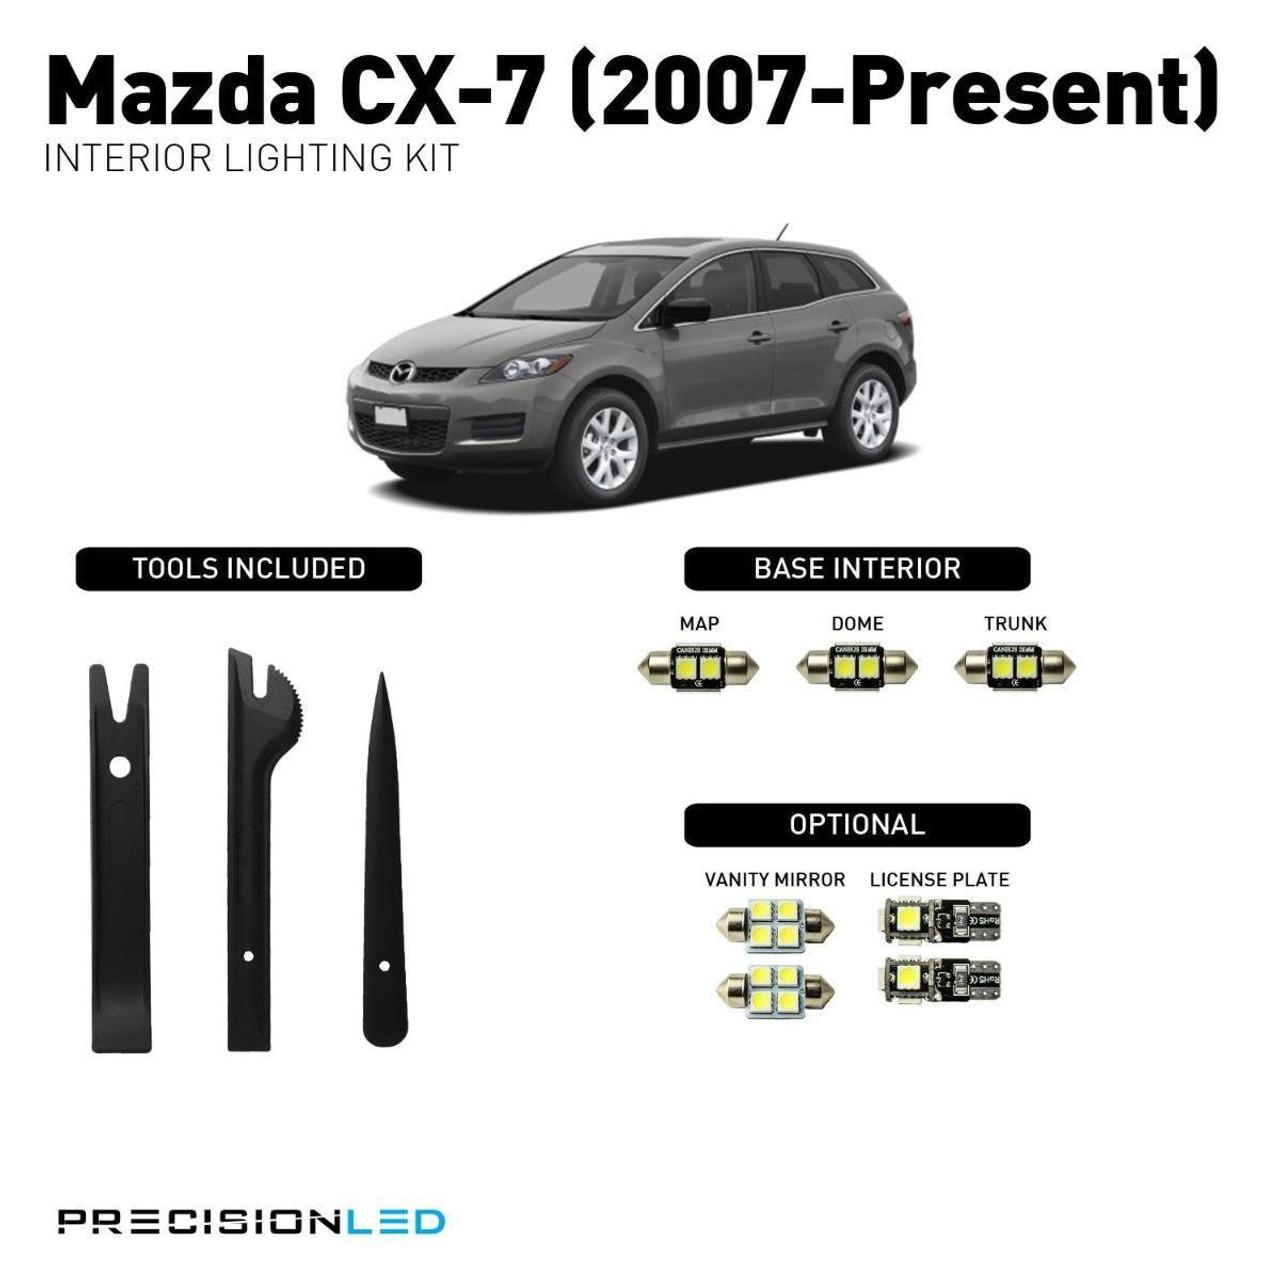 Mazda CX-7 LED Interior Package (2007-Present)